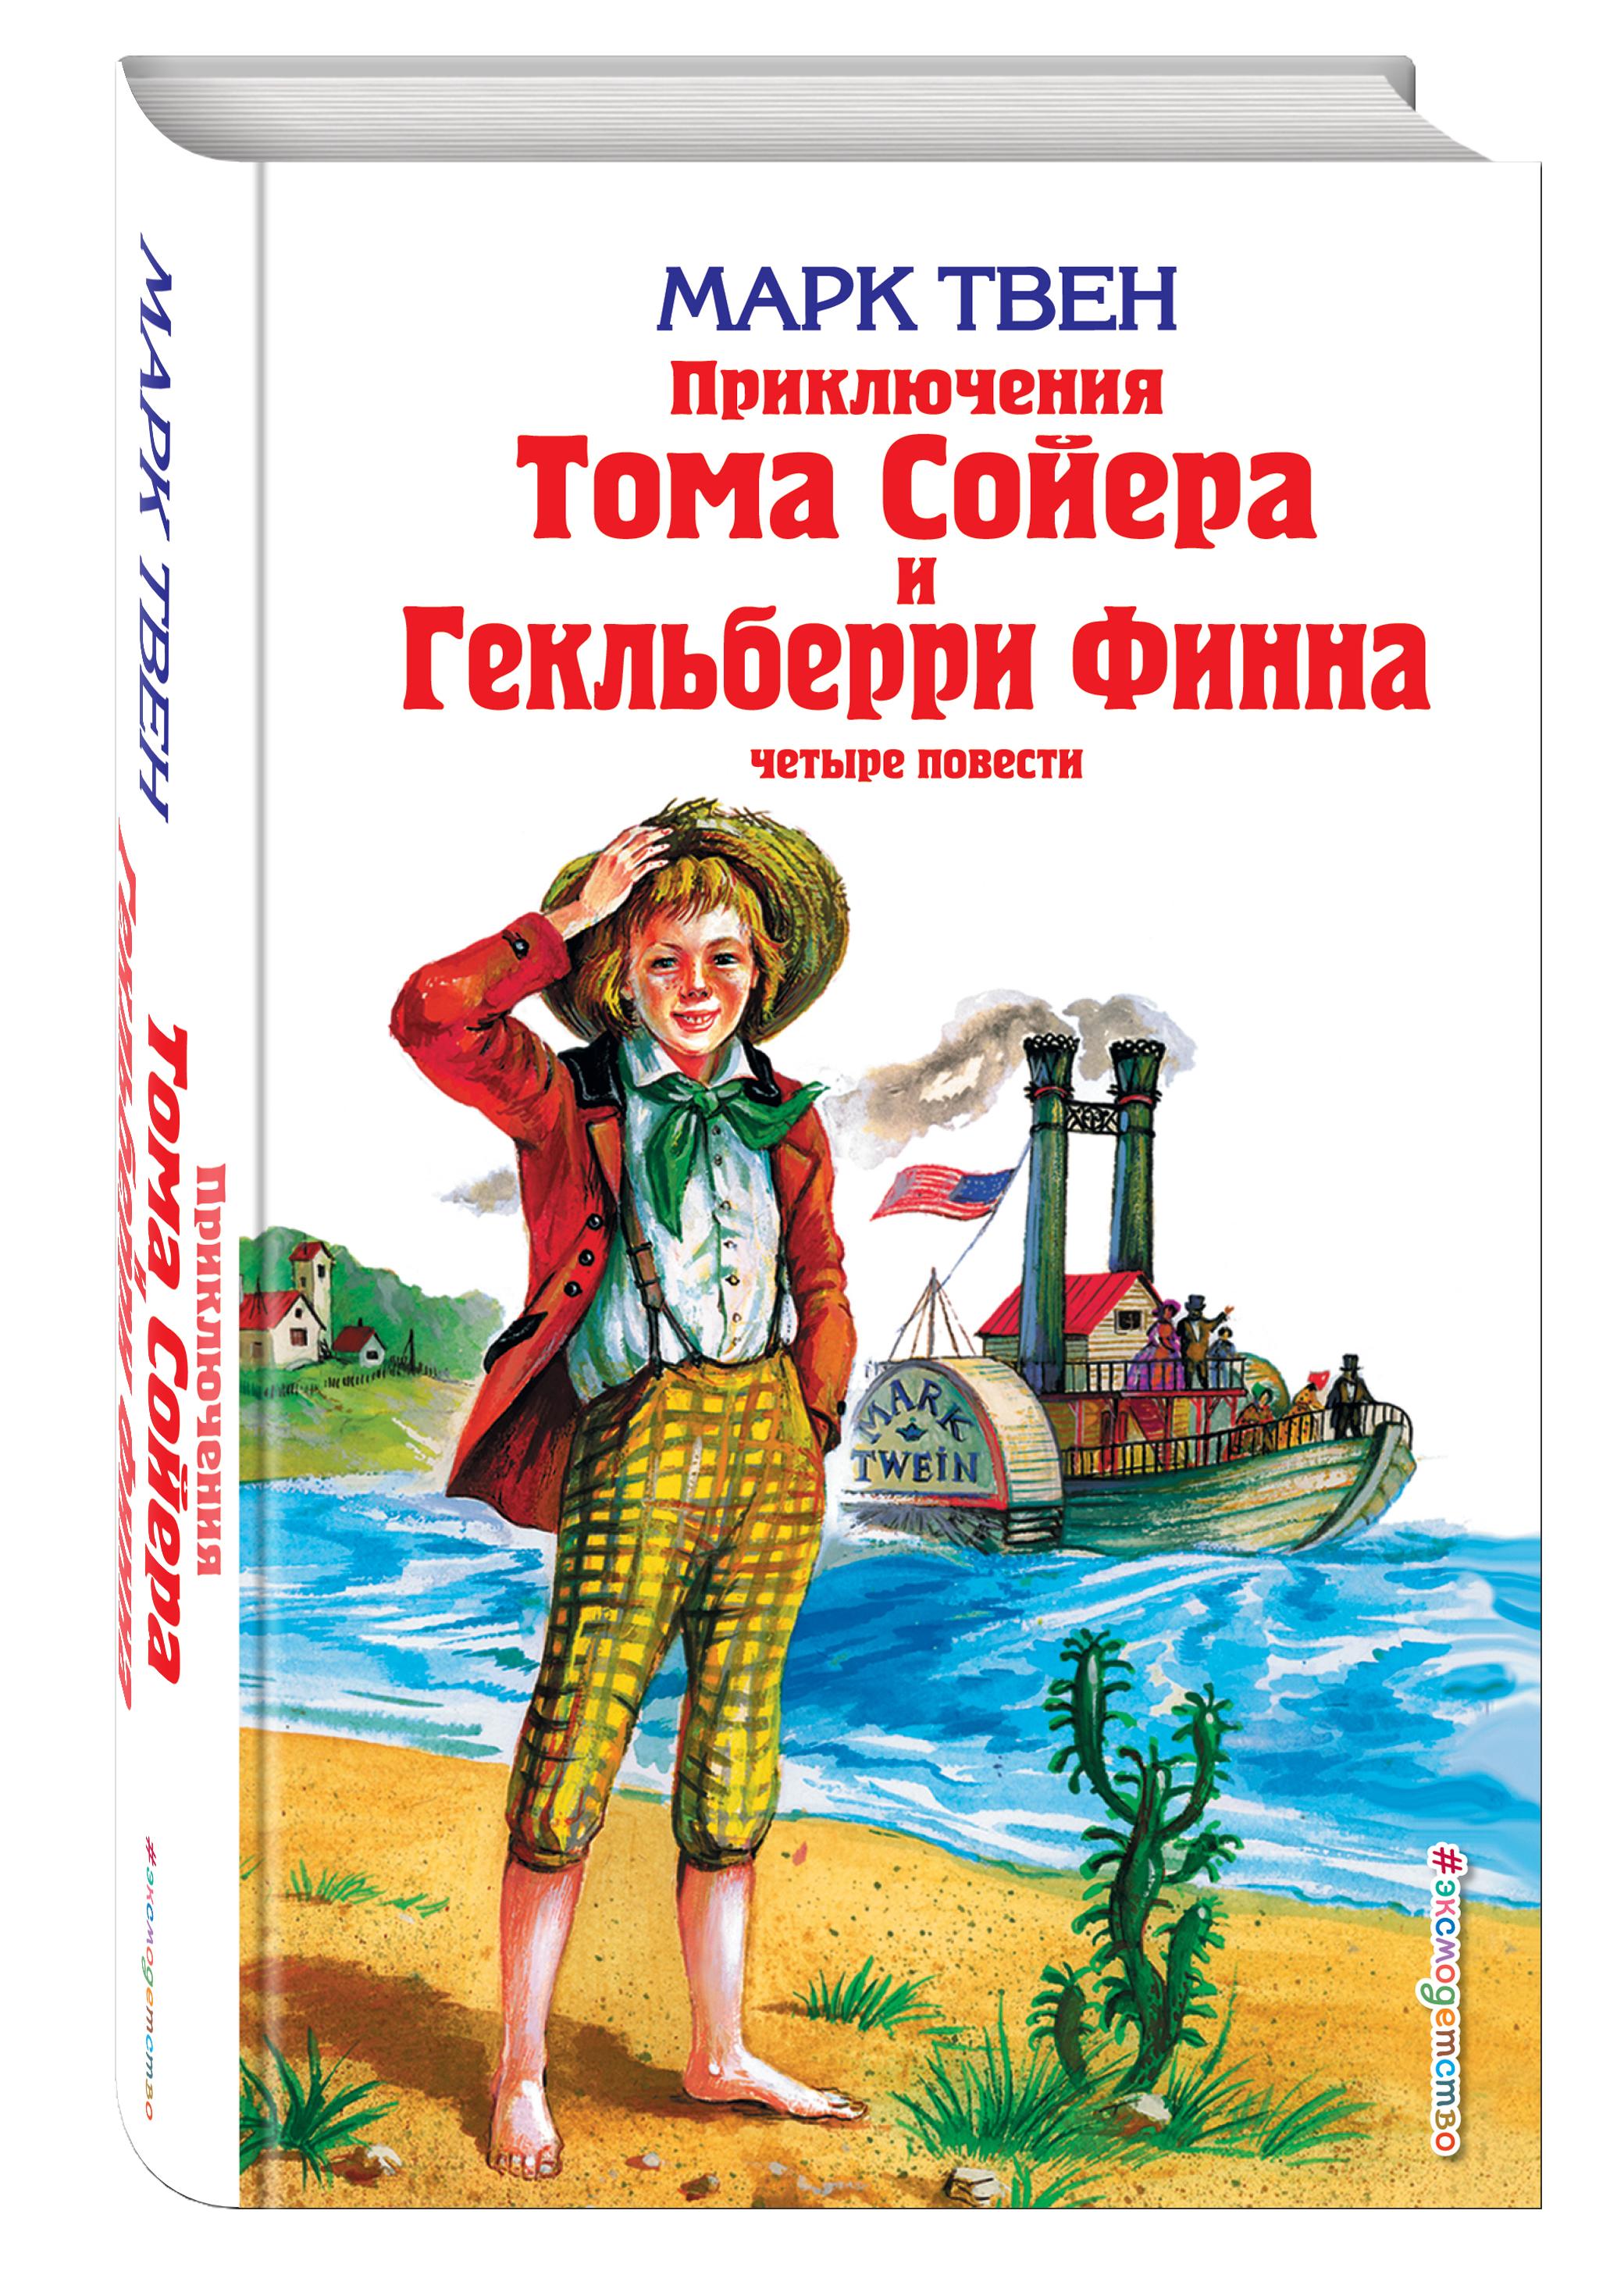 Твен Марк Приключения Тома Сойера и Гекльберри Финна цены онлайн